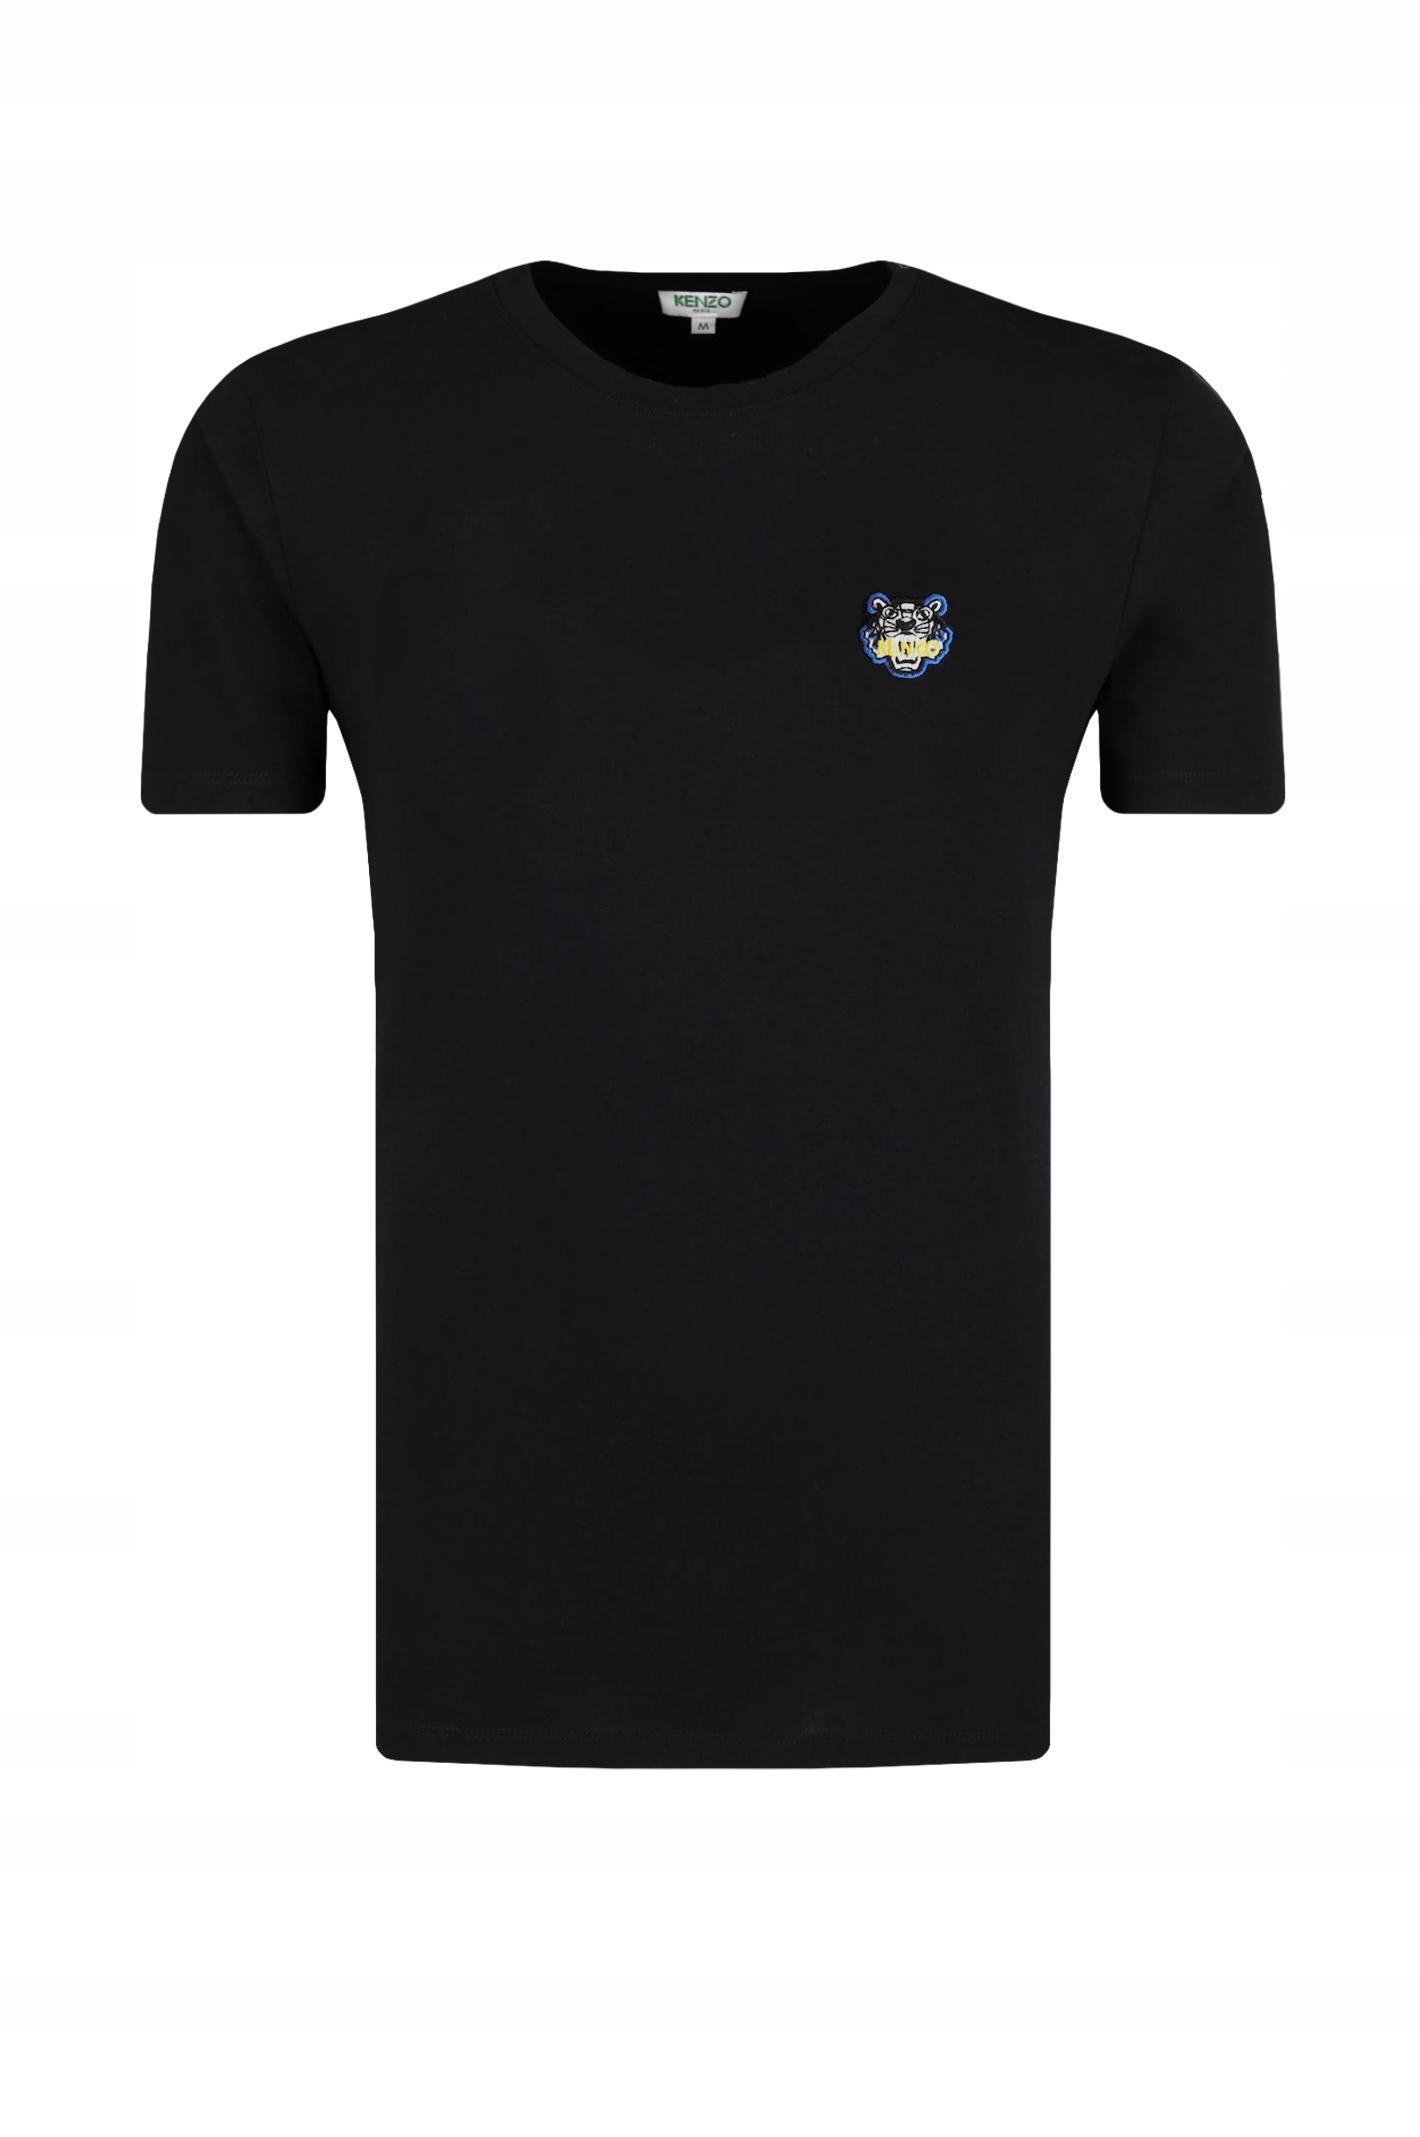 Kenzo T-Shirt Rozmiar XXL Koszulka Paris Men 2019